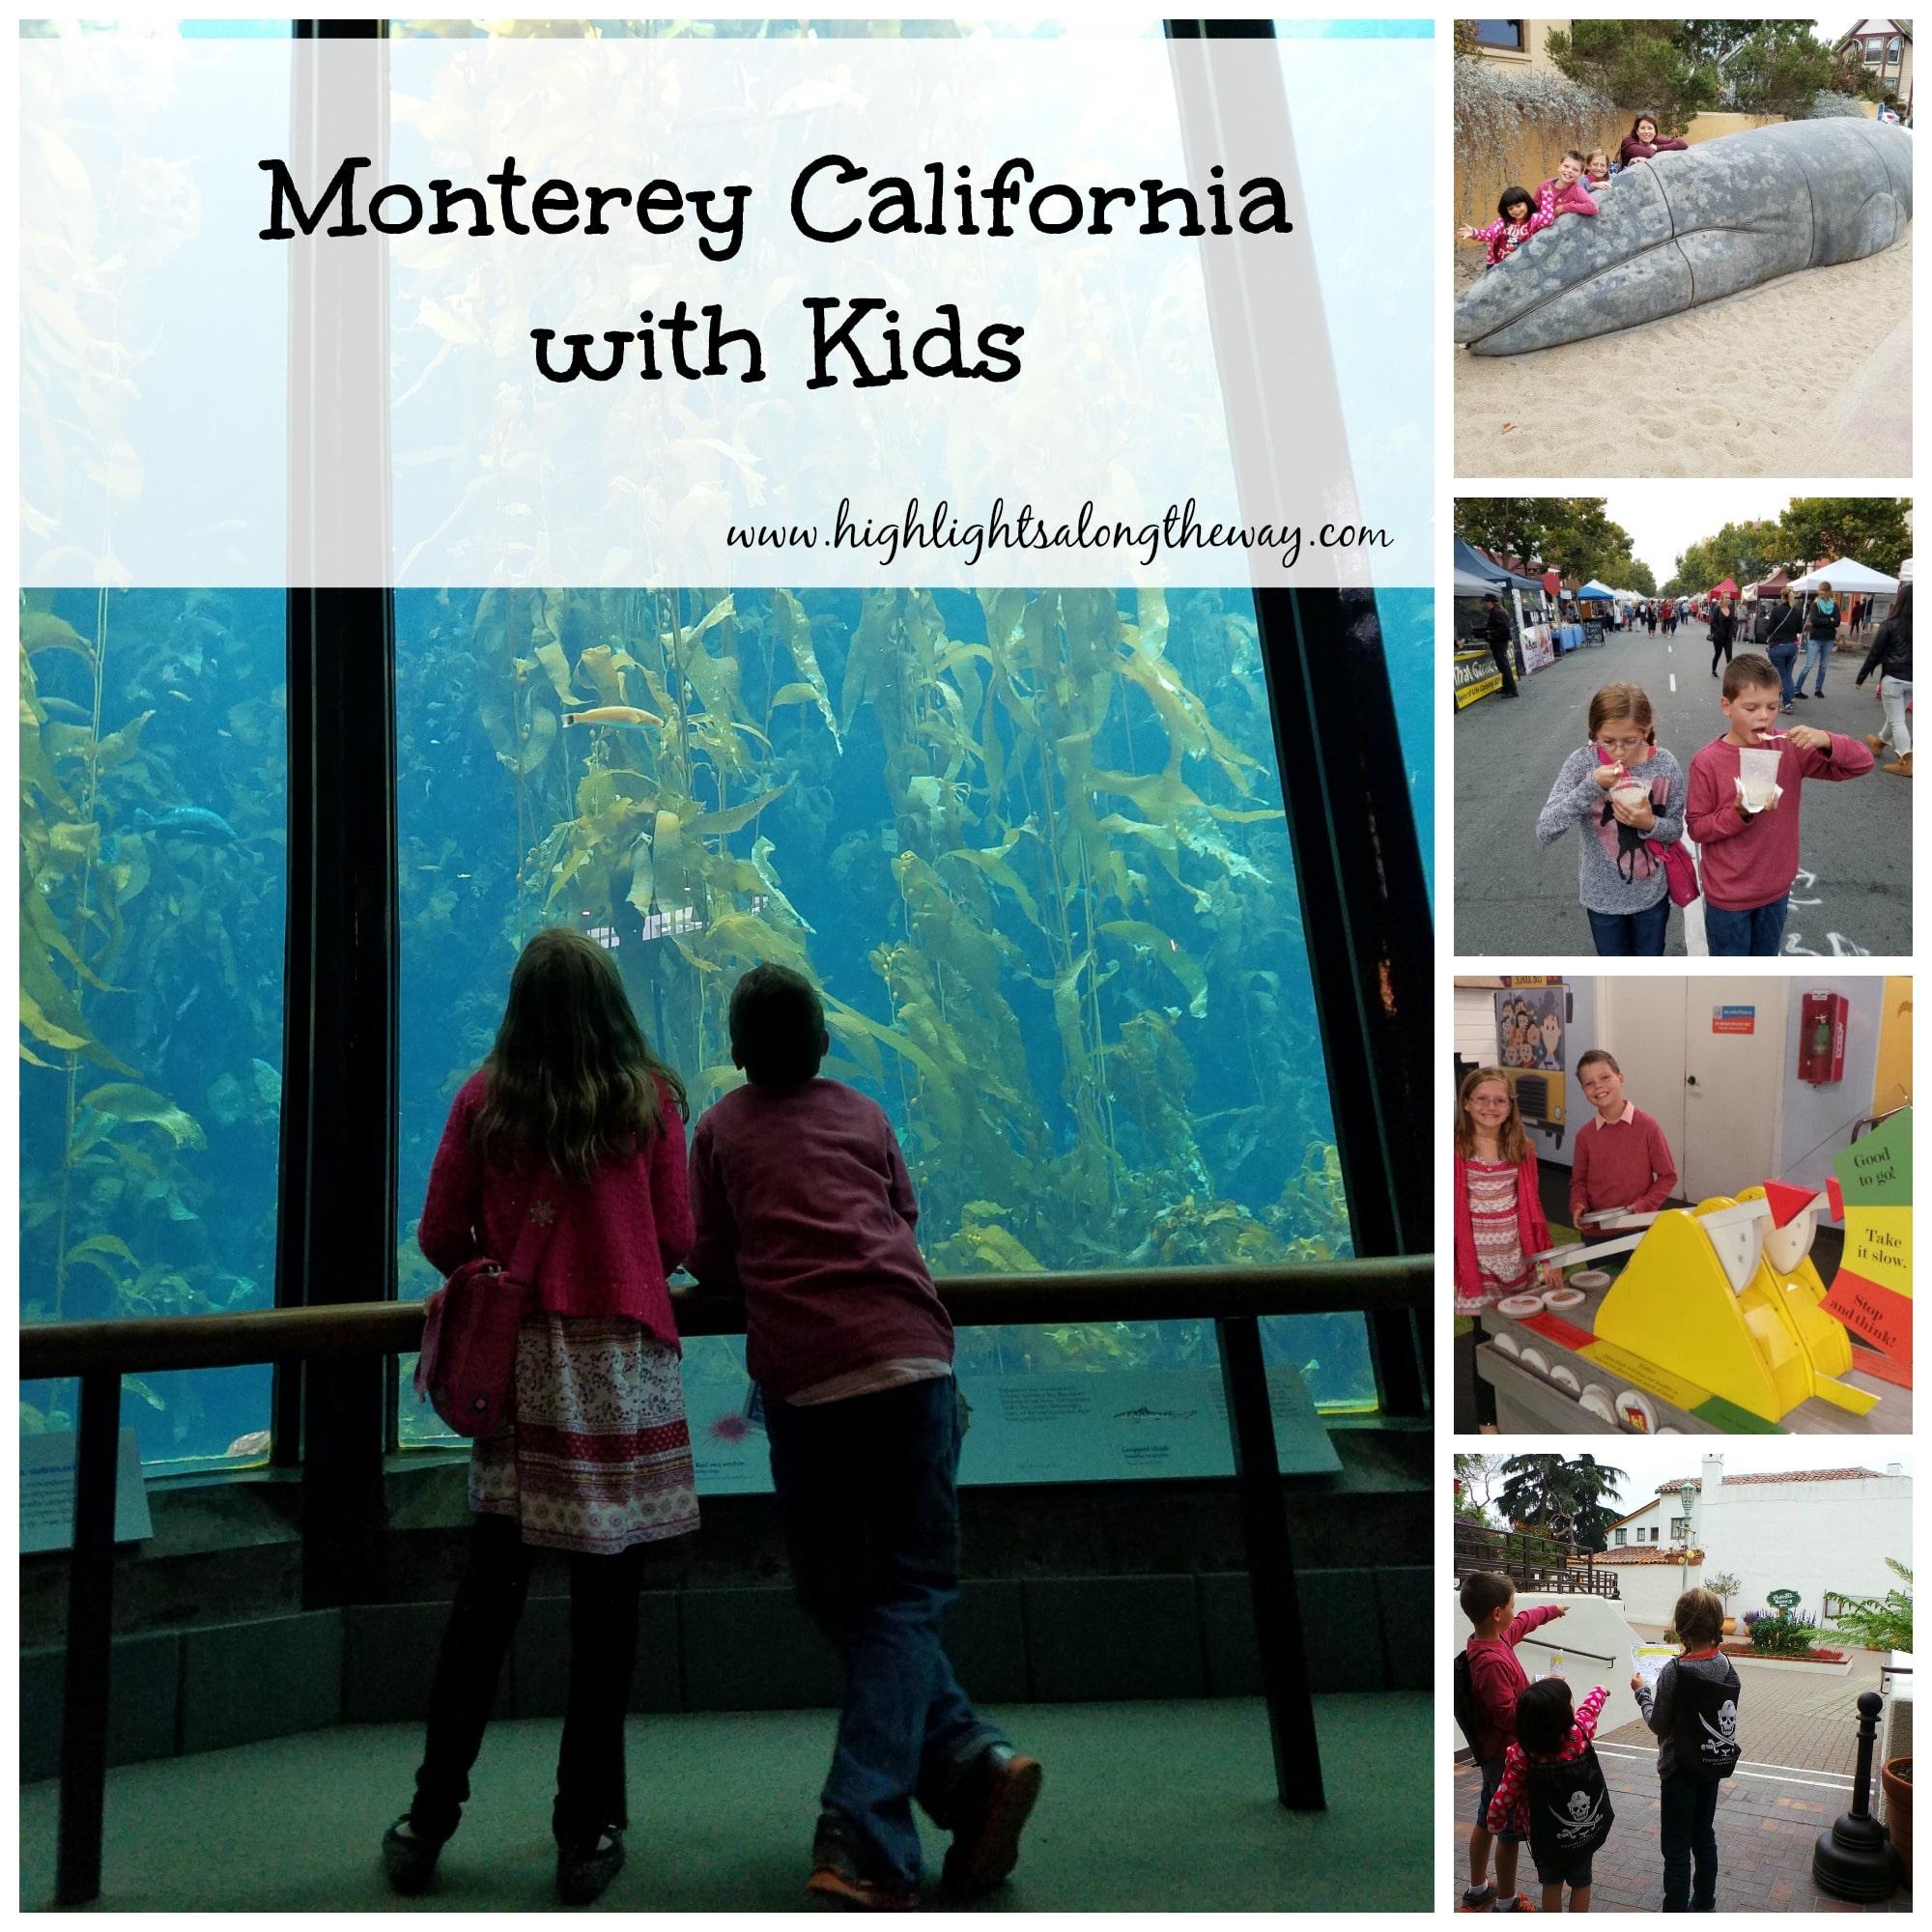 Monterey California with kids - Free jellyfish printable.